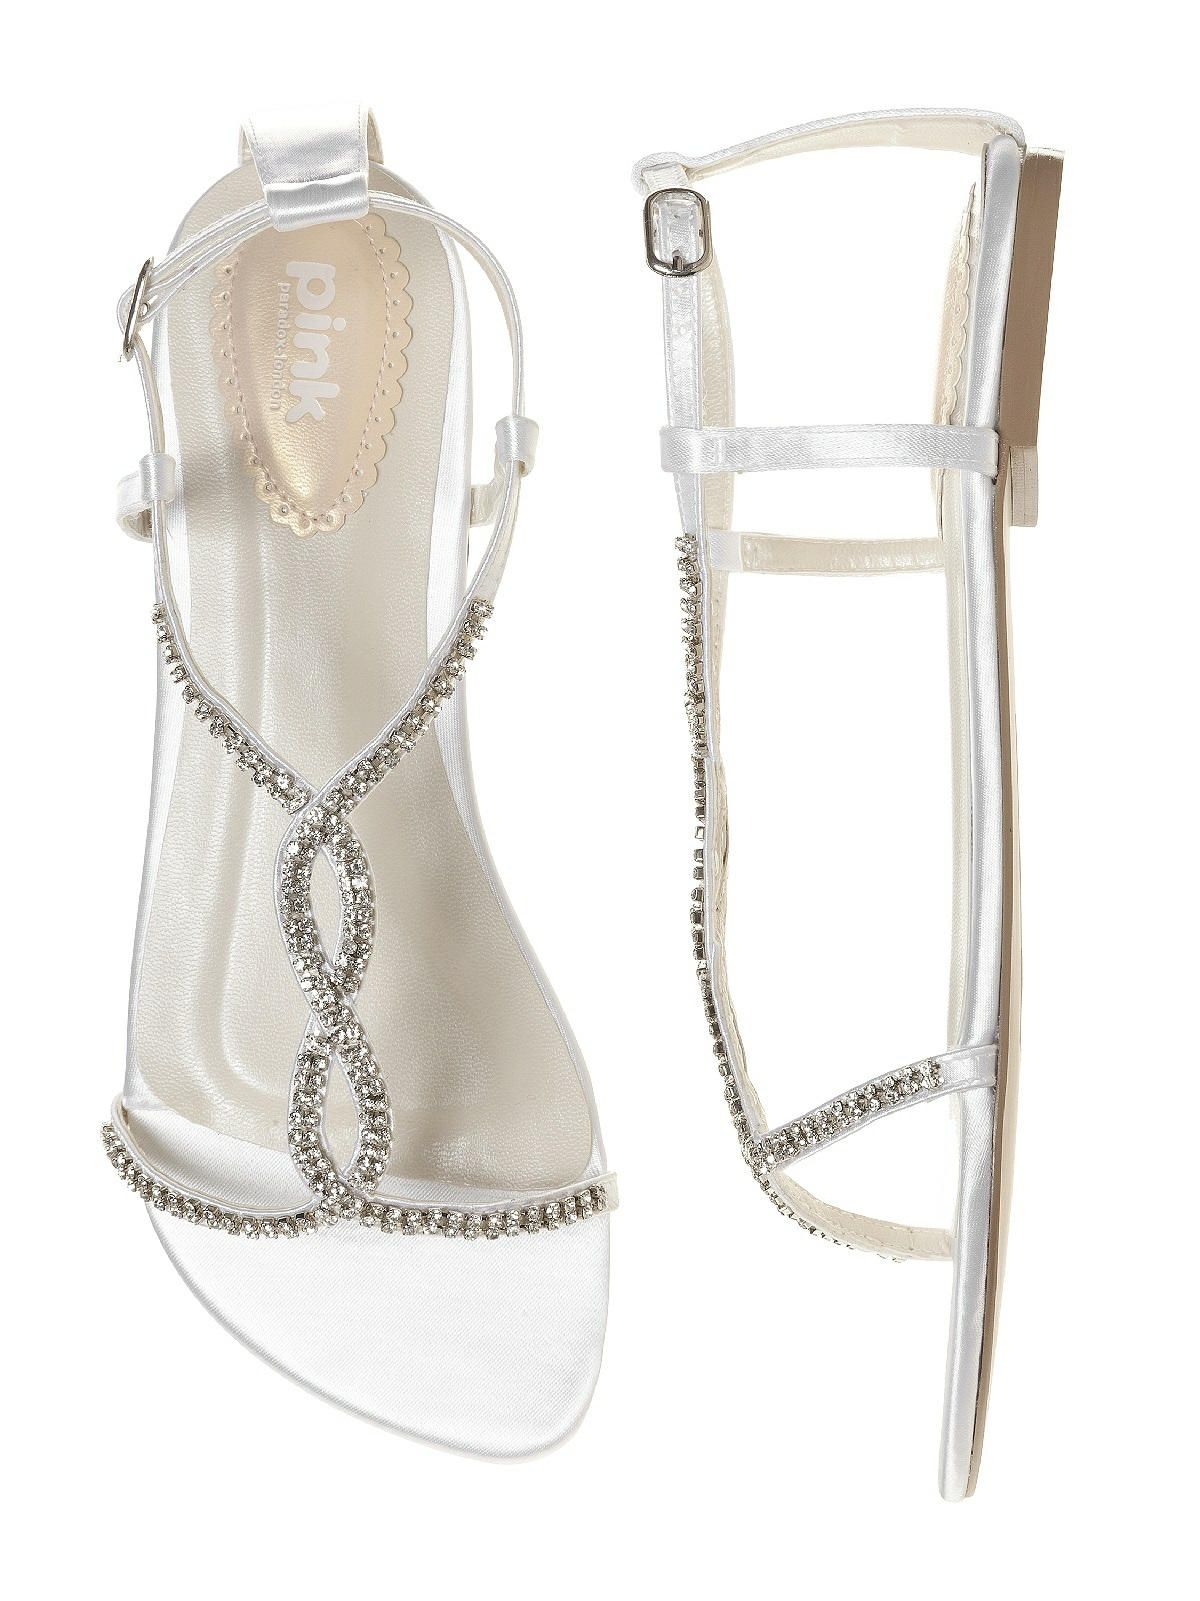 Heaven Dyeable Crystal Bridal Sandal In White White Bridal Sandals Beach Wedding Shoes Wedding Shoes,Casual Designer Wedding Dresses